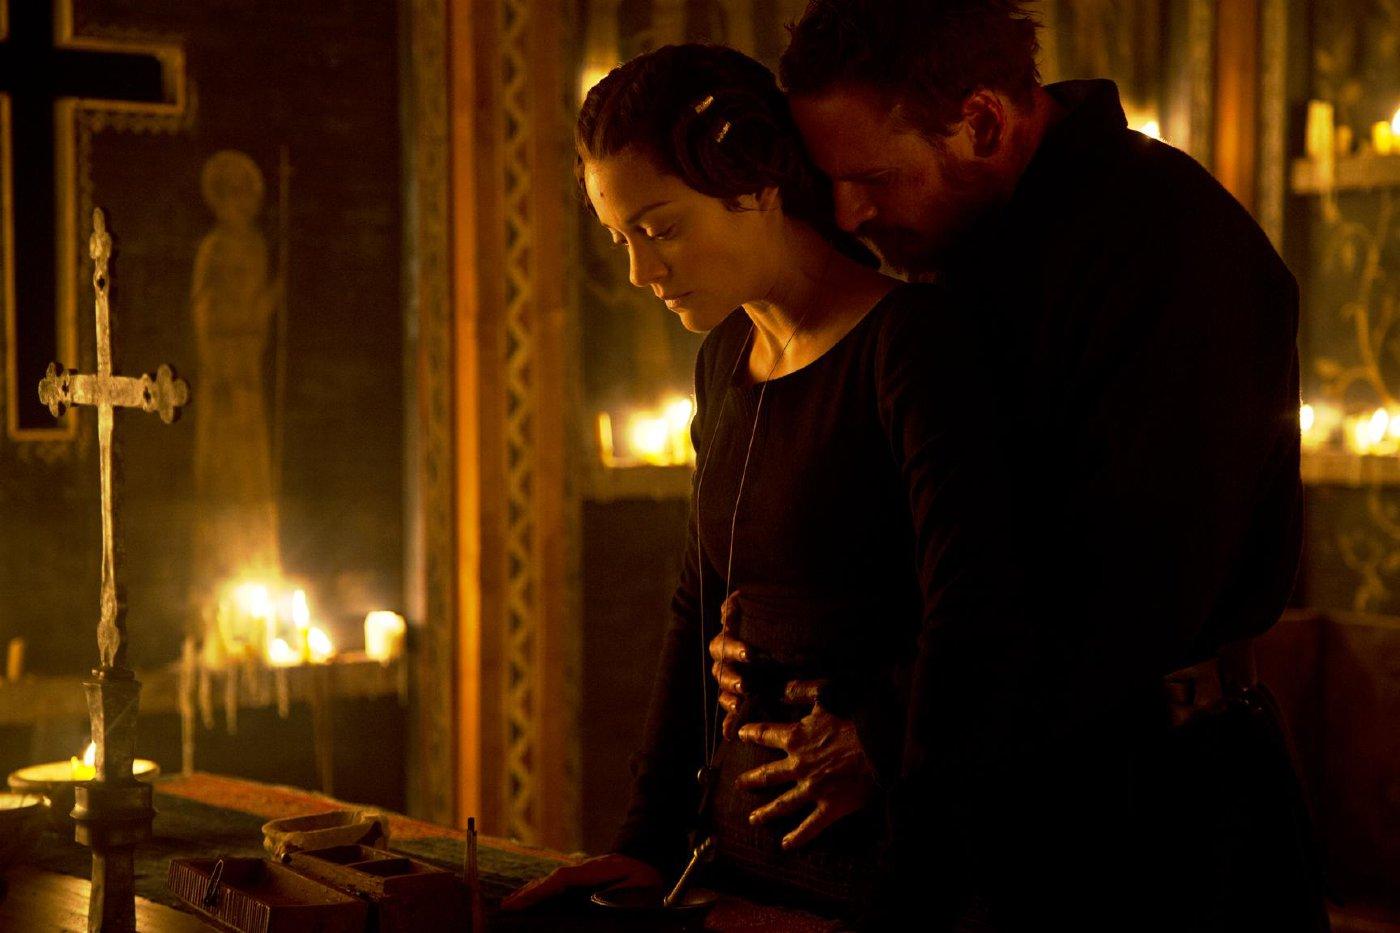 Marion Cotillard com Michael Fassbender em cena de Macbeth (photo by outnow.ch)